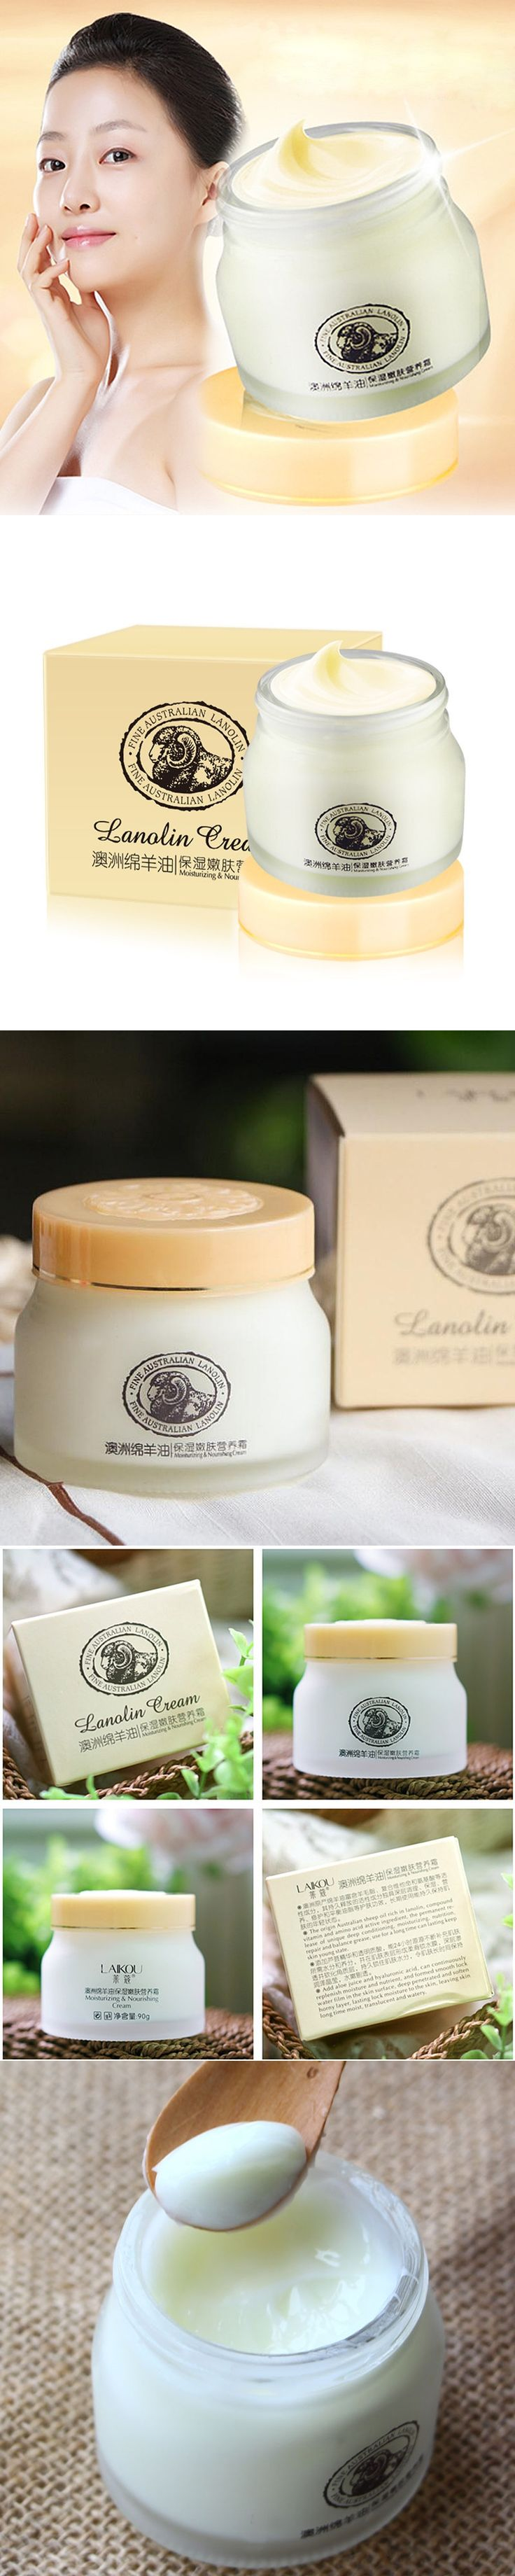 Australia Sheep Oil Lanolin Cream Whitening Anti-Aging Anti Wrinkle Moisturizing Nourish Creams Beauty Face Skin Care HB